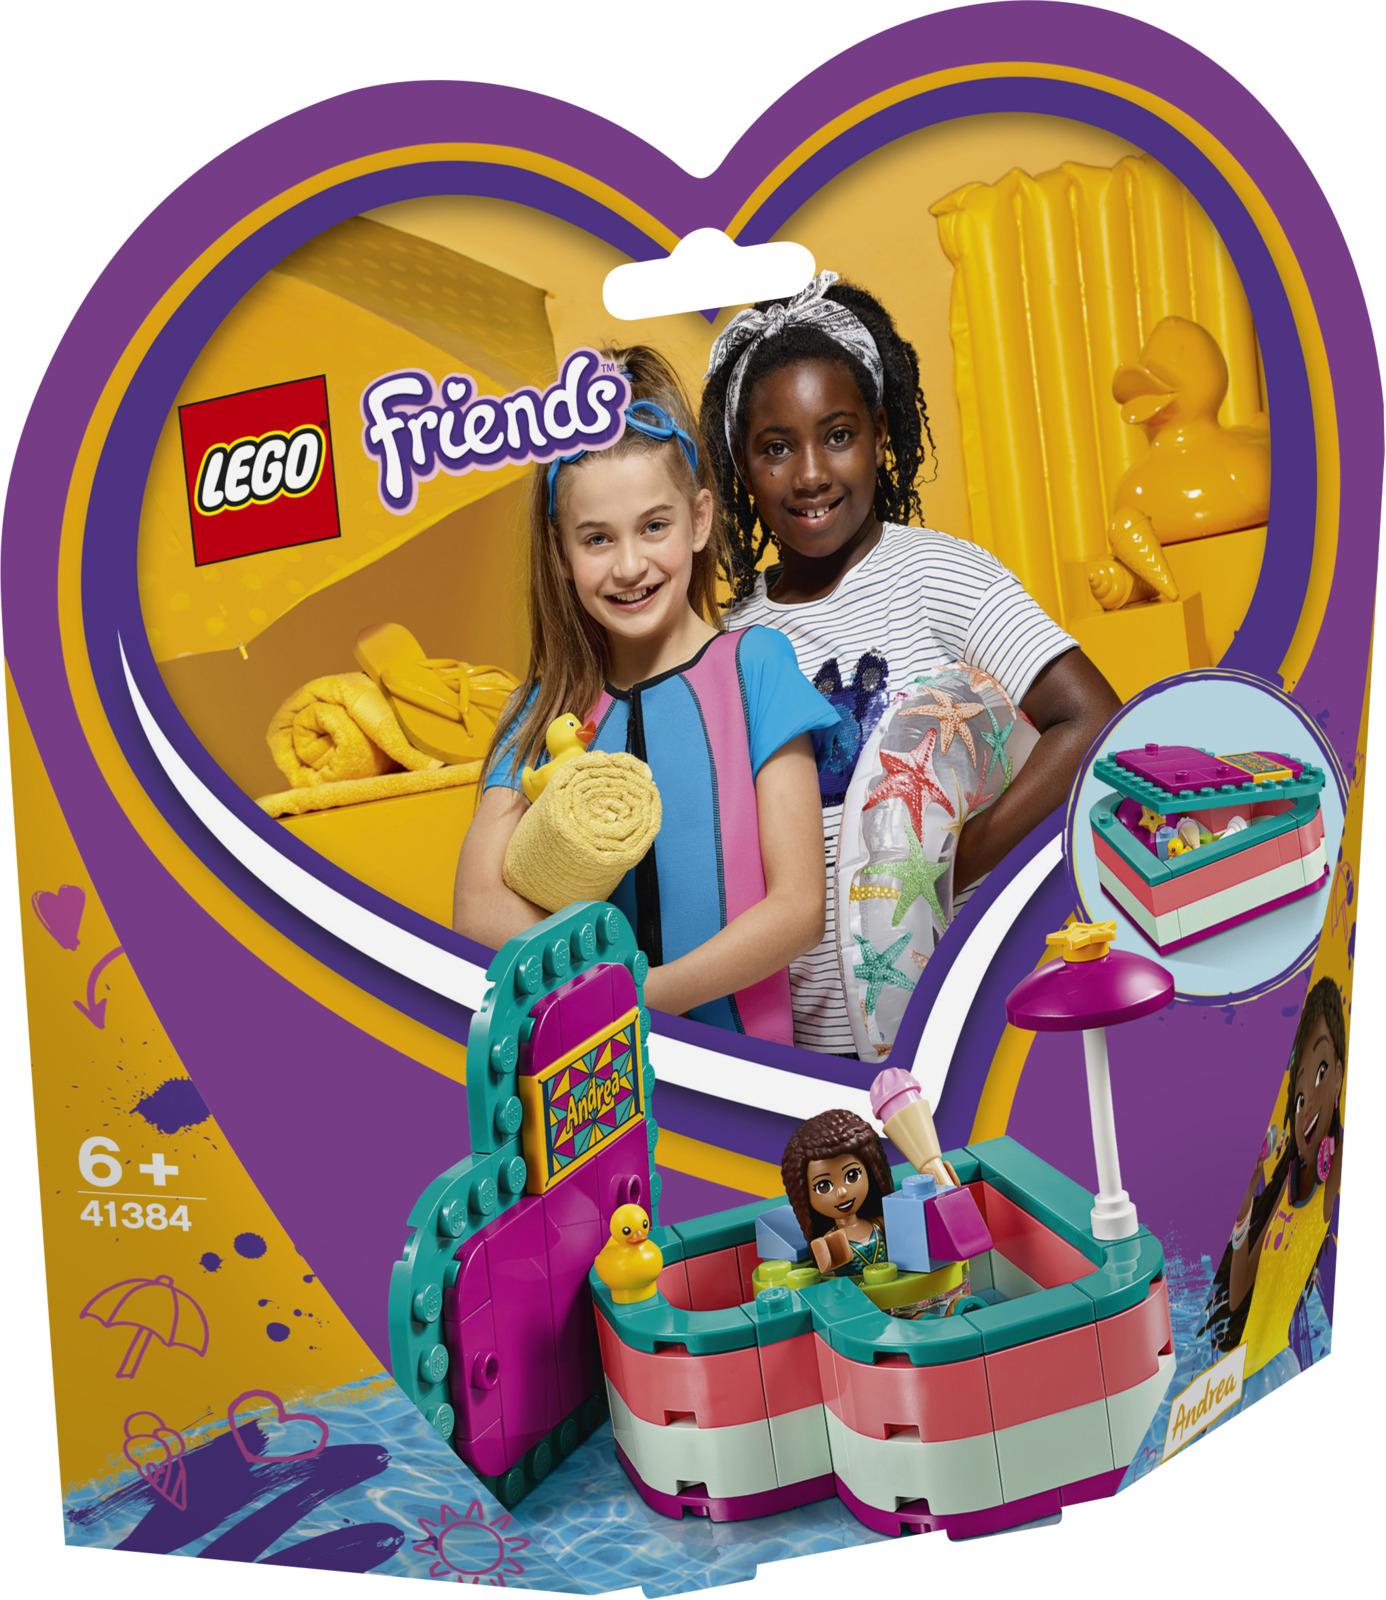 LEGO Friends 41384 Летняя шкатулка-сердечко для Андреа Конструктор lego friends 41341 комната андреа конструктор